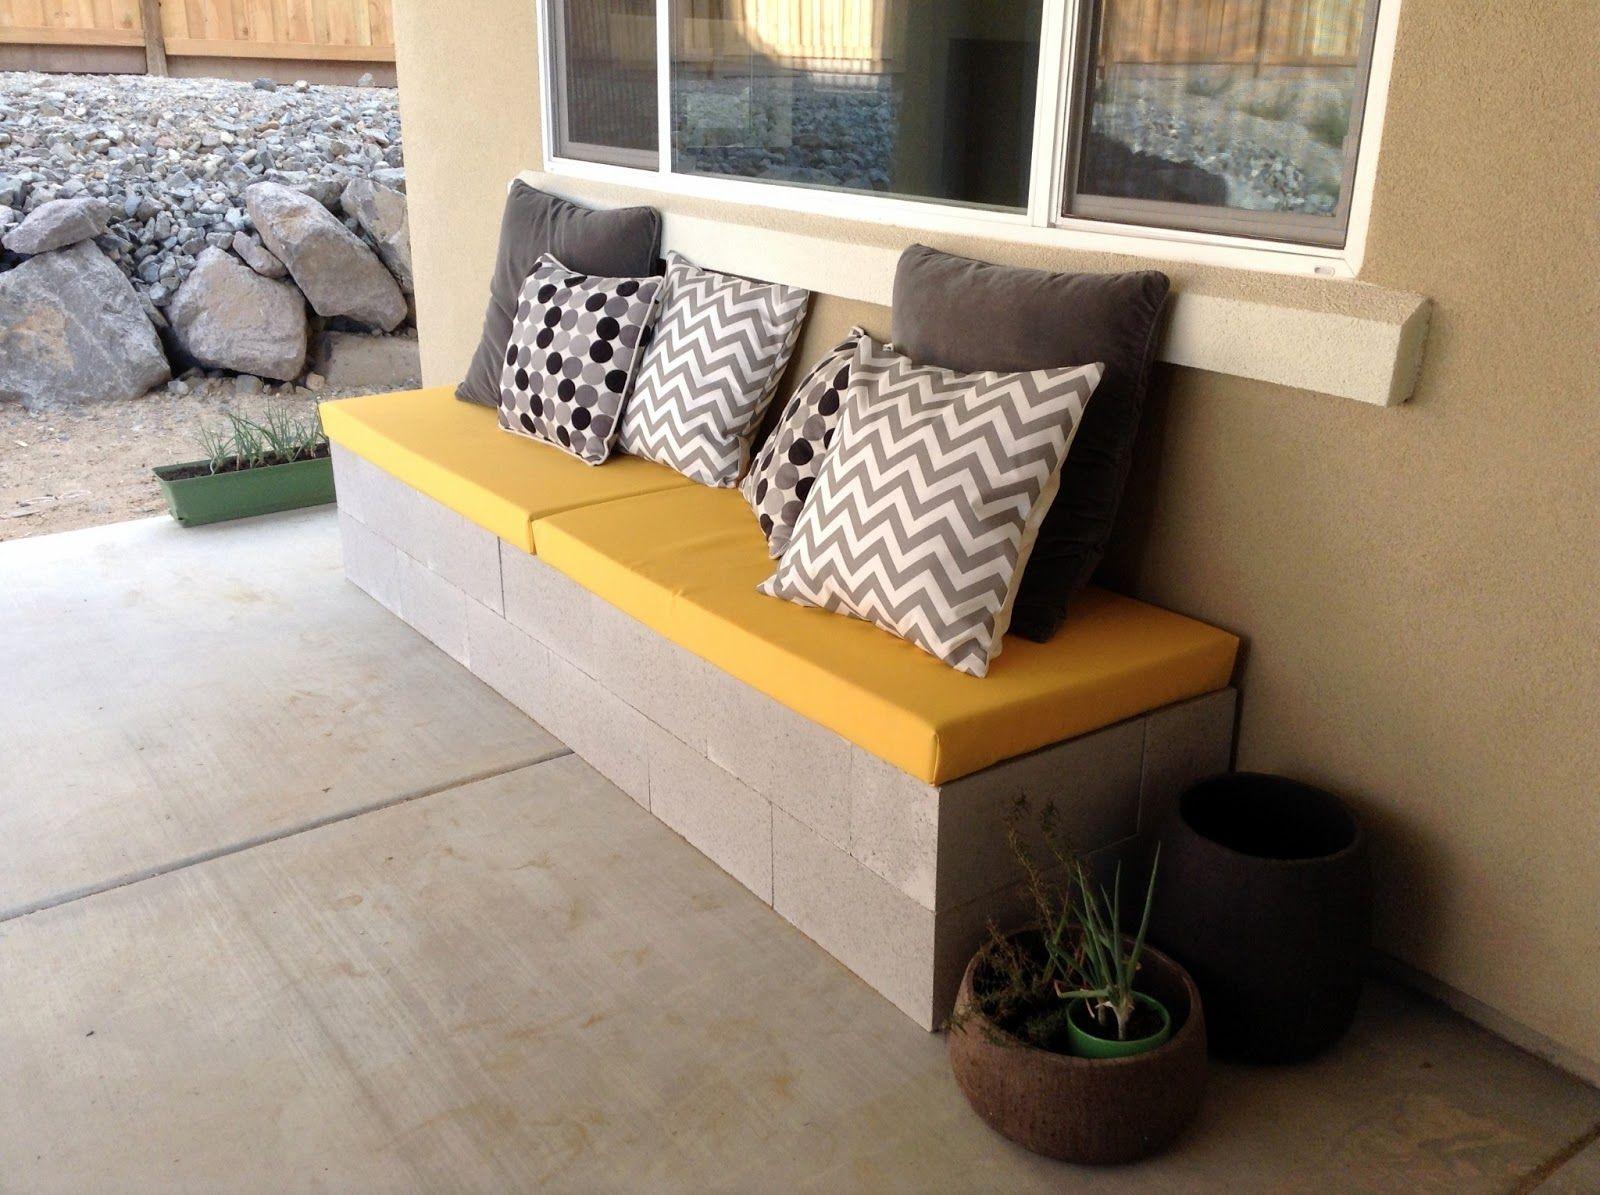 Diy Cinder Block Outdoor Bench With Storage